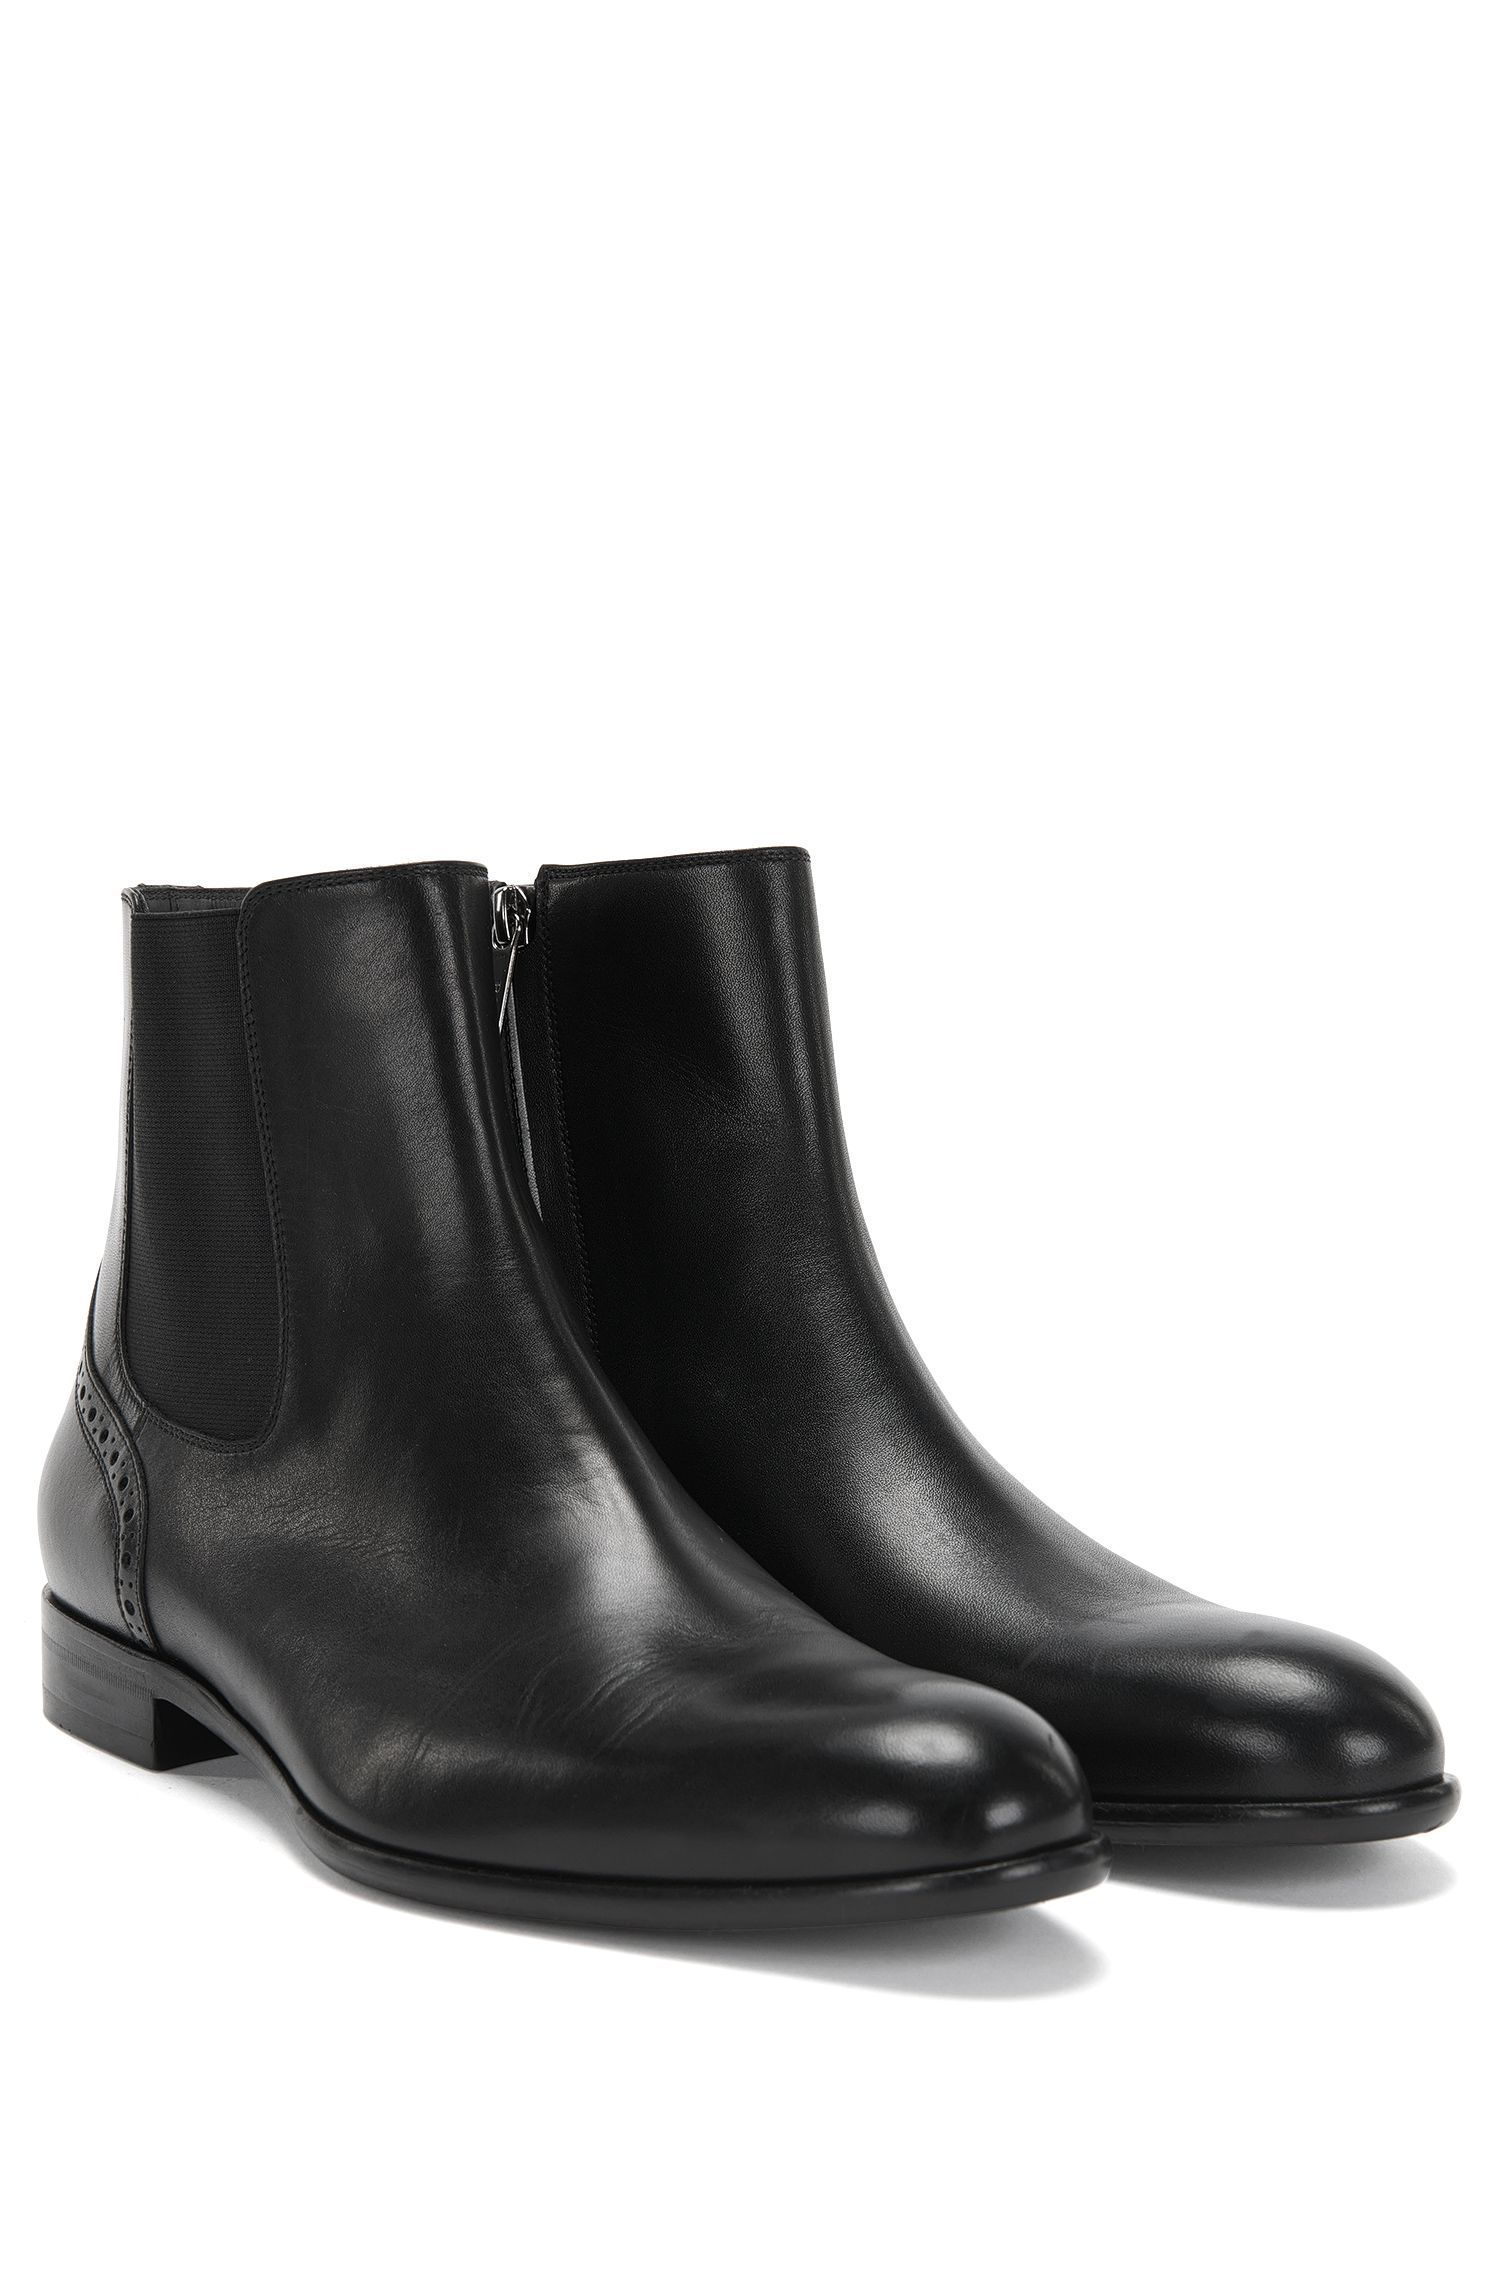 'Manhattan Cheb Itpt'   Italian Calfskin Chelsea Boots